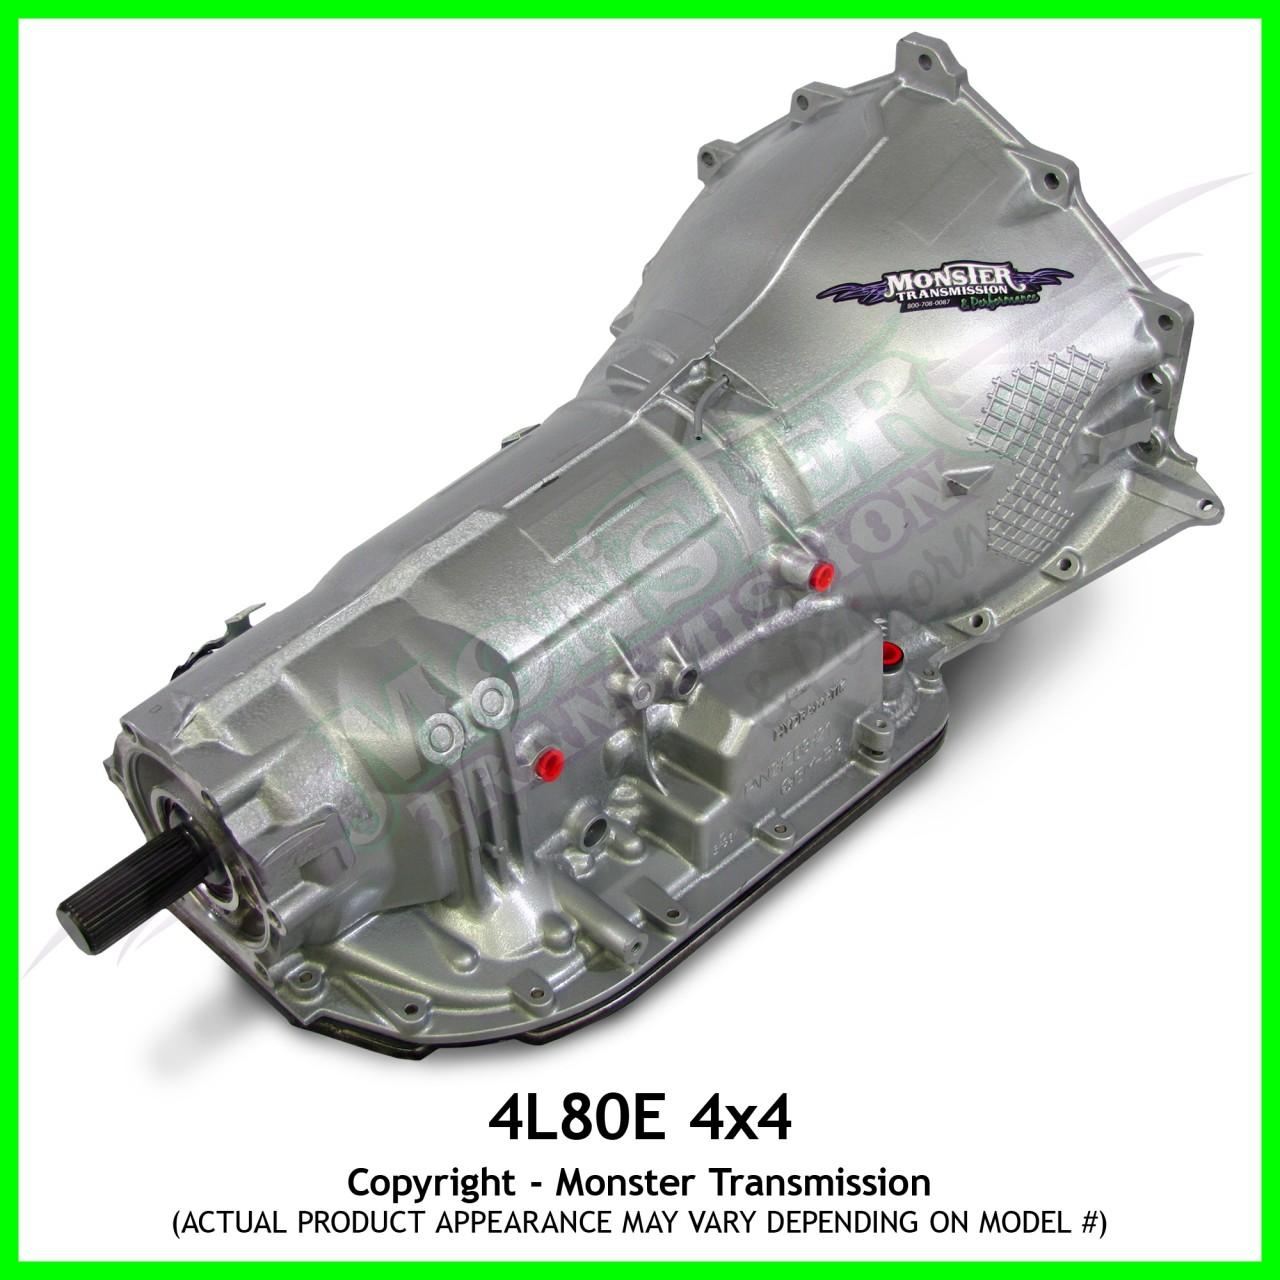 hight resolution of 4l80e transmission 4wd 4l80e 4x4 4l80 e 4l80 heavy duty 4l80e rebuild 4l80e monster 4l80e transmission 4l80e free shipping